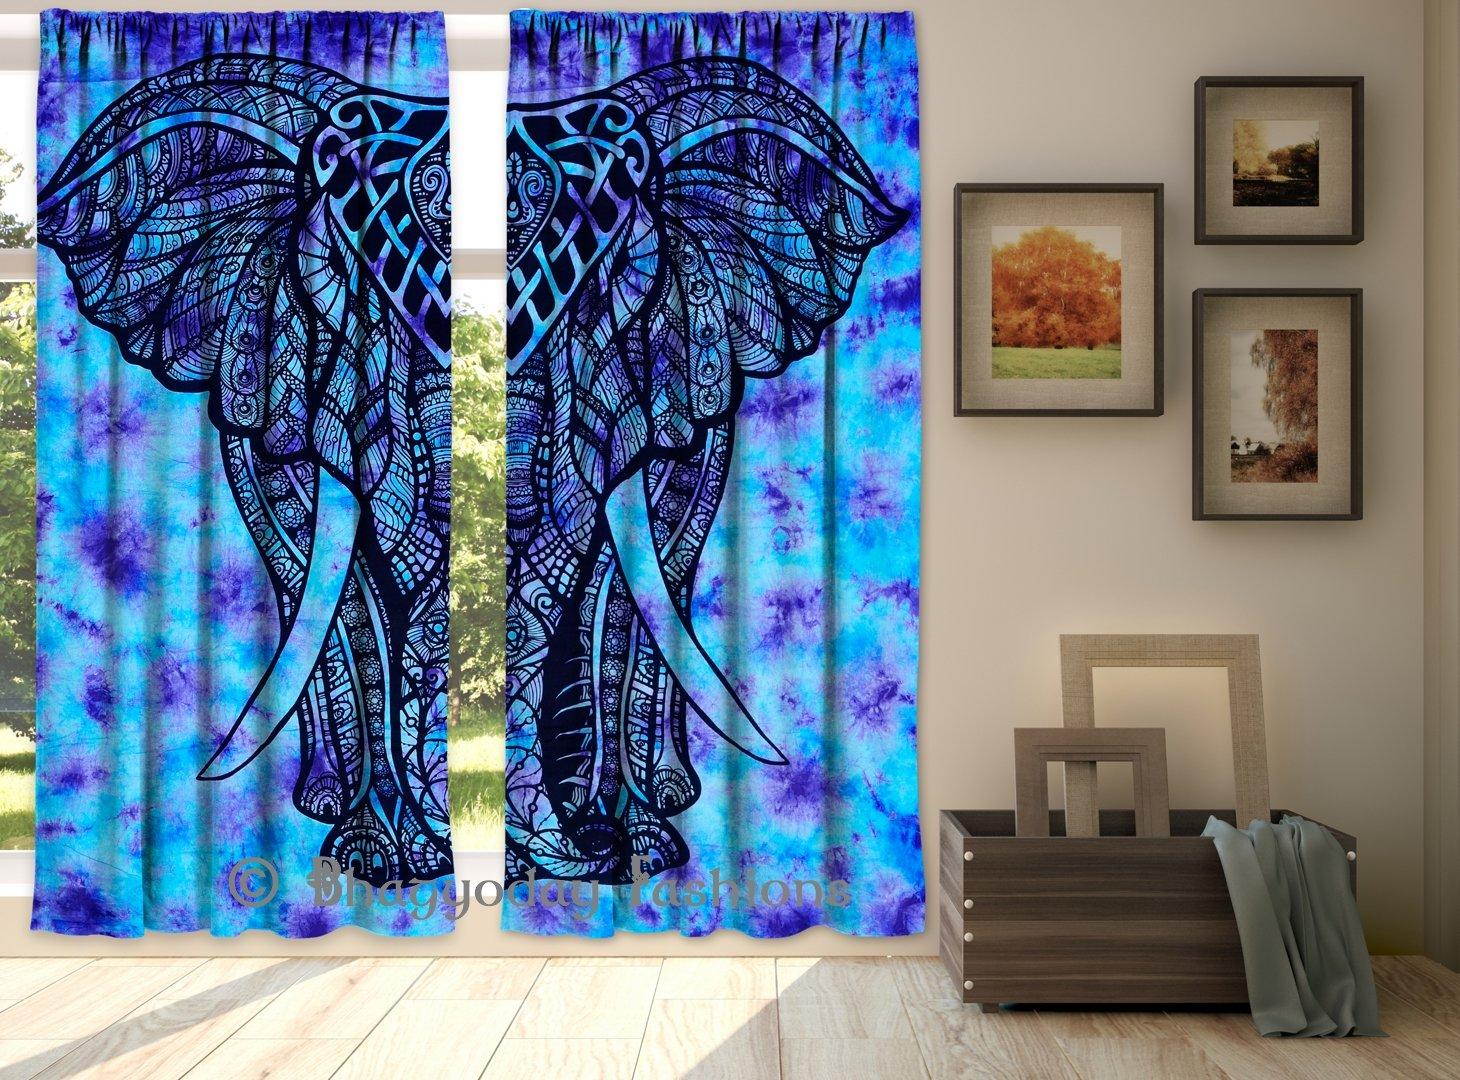 Amazon.com: Elephant Mandala Indian Hippie Curtains Drape Balcony ...